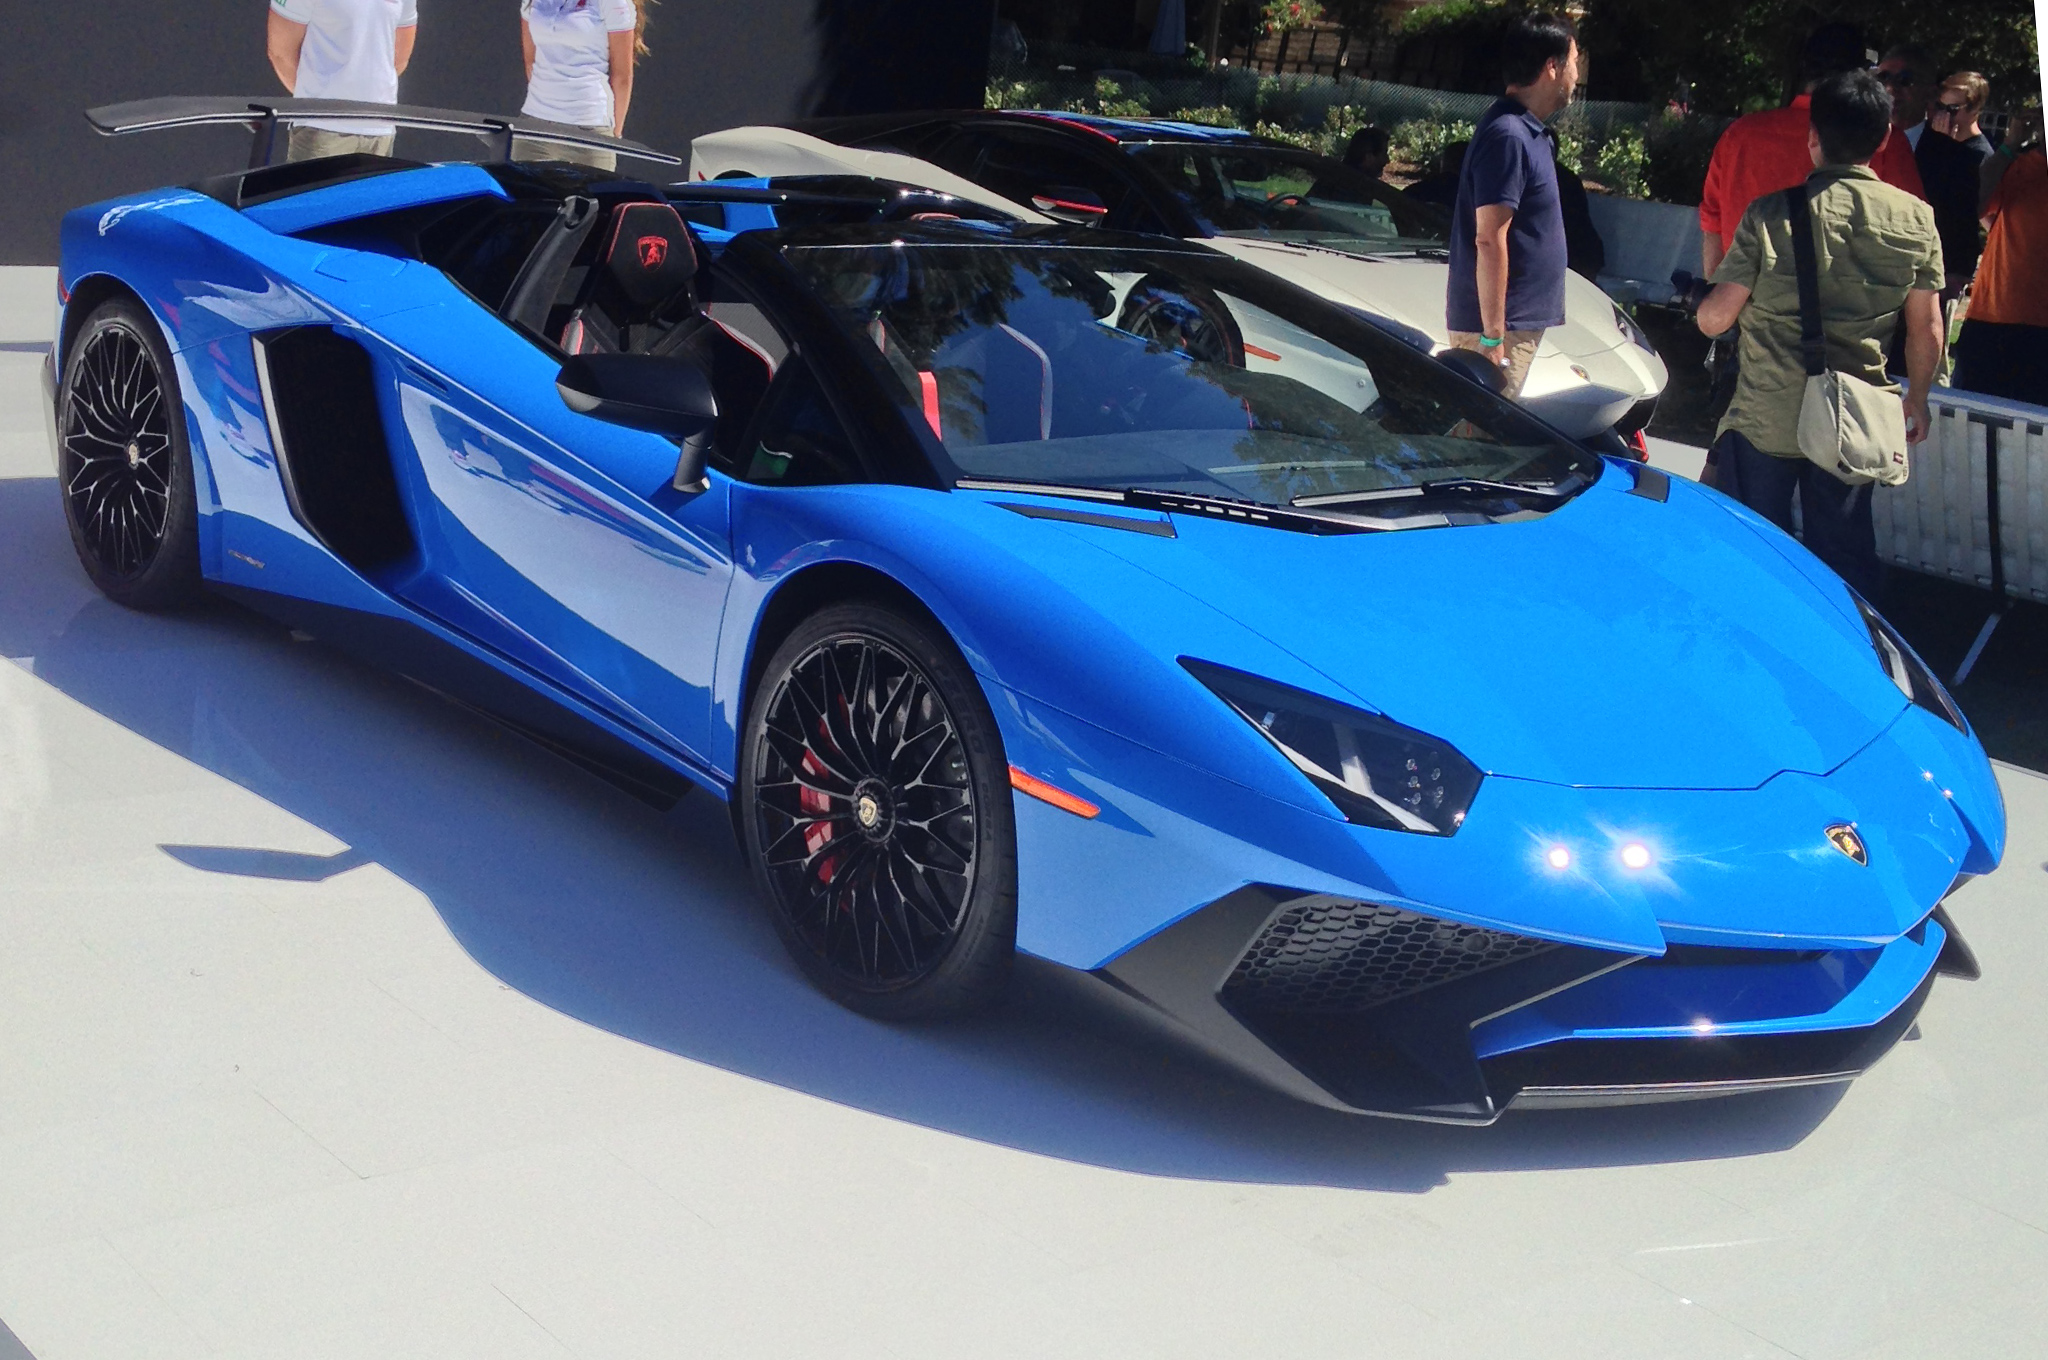 530k Lamborghini Aventador Sv Roadster Unveiled